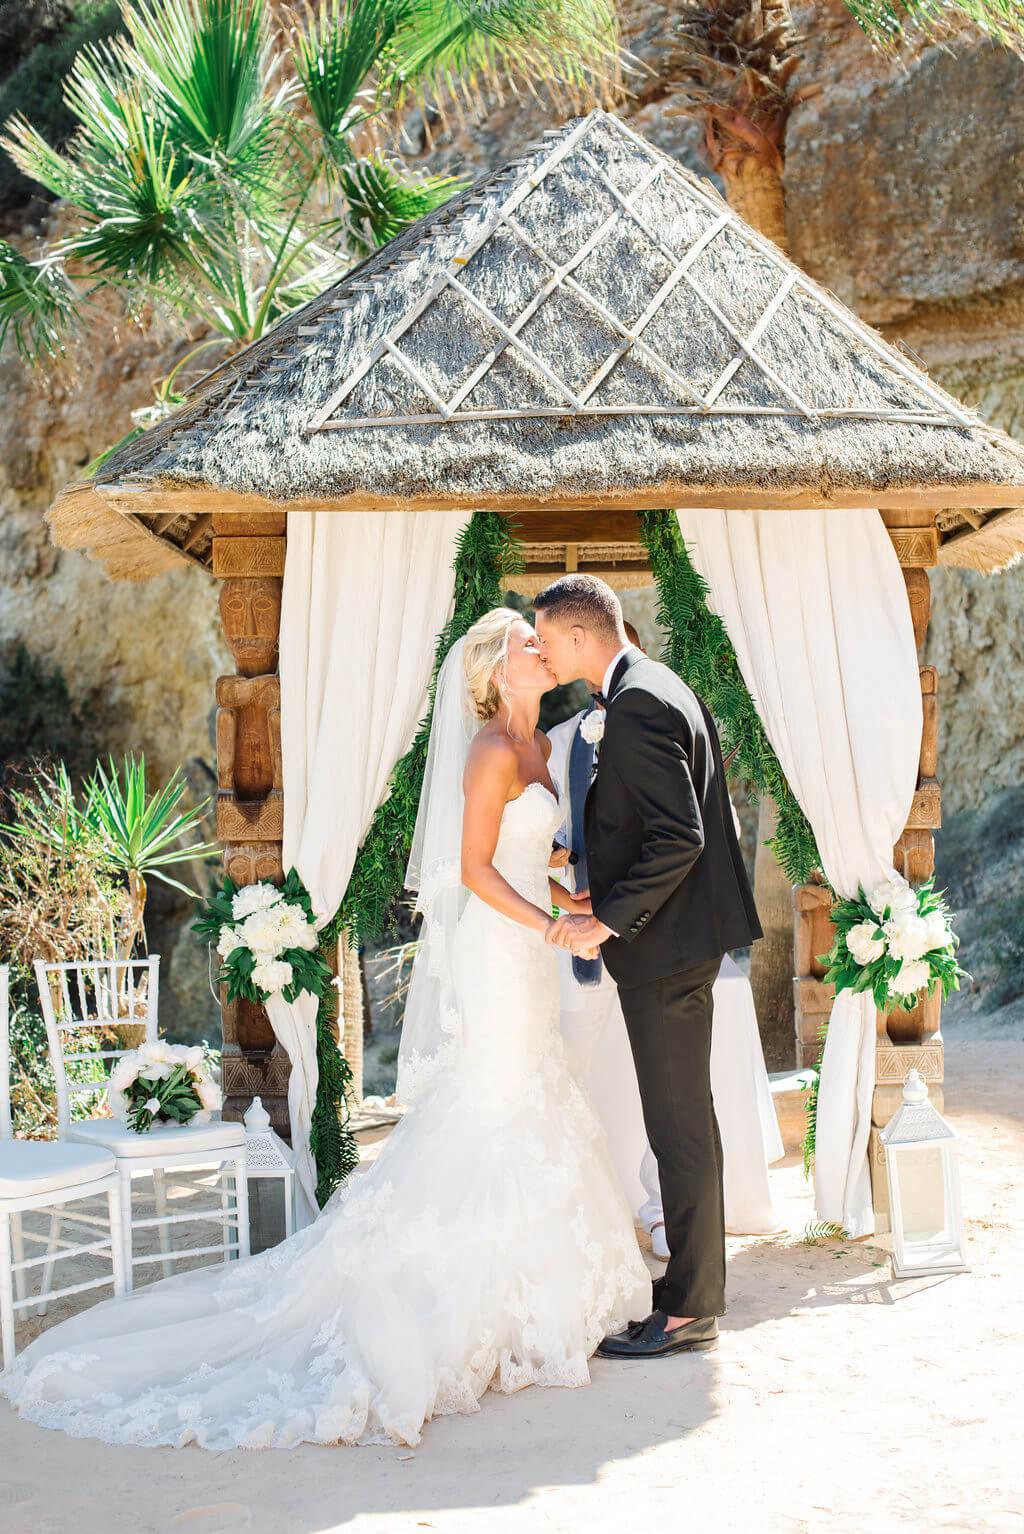 https://www.white-ibiza.com/wp-content/uploads/2020/03/ibiza-wedding-venues-amante-ibiza-2020-03.jpg